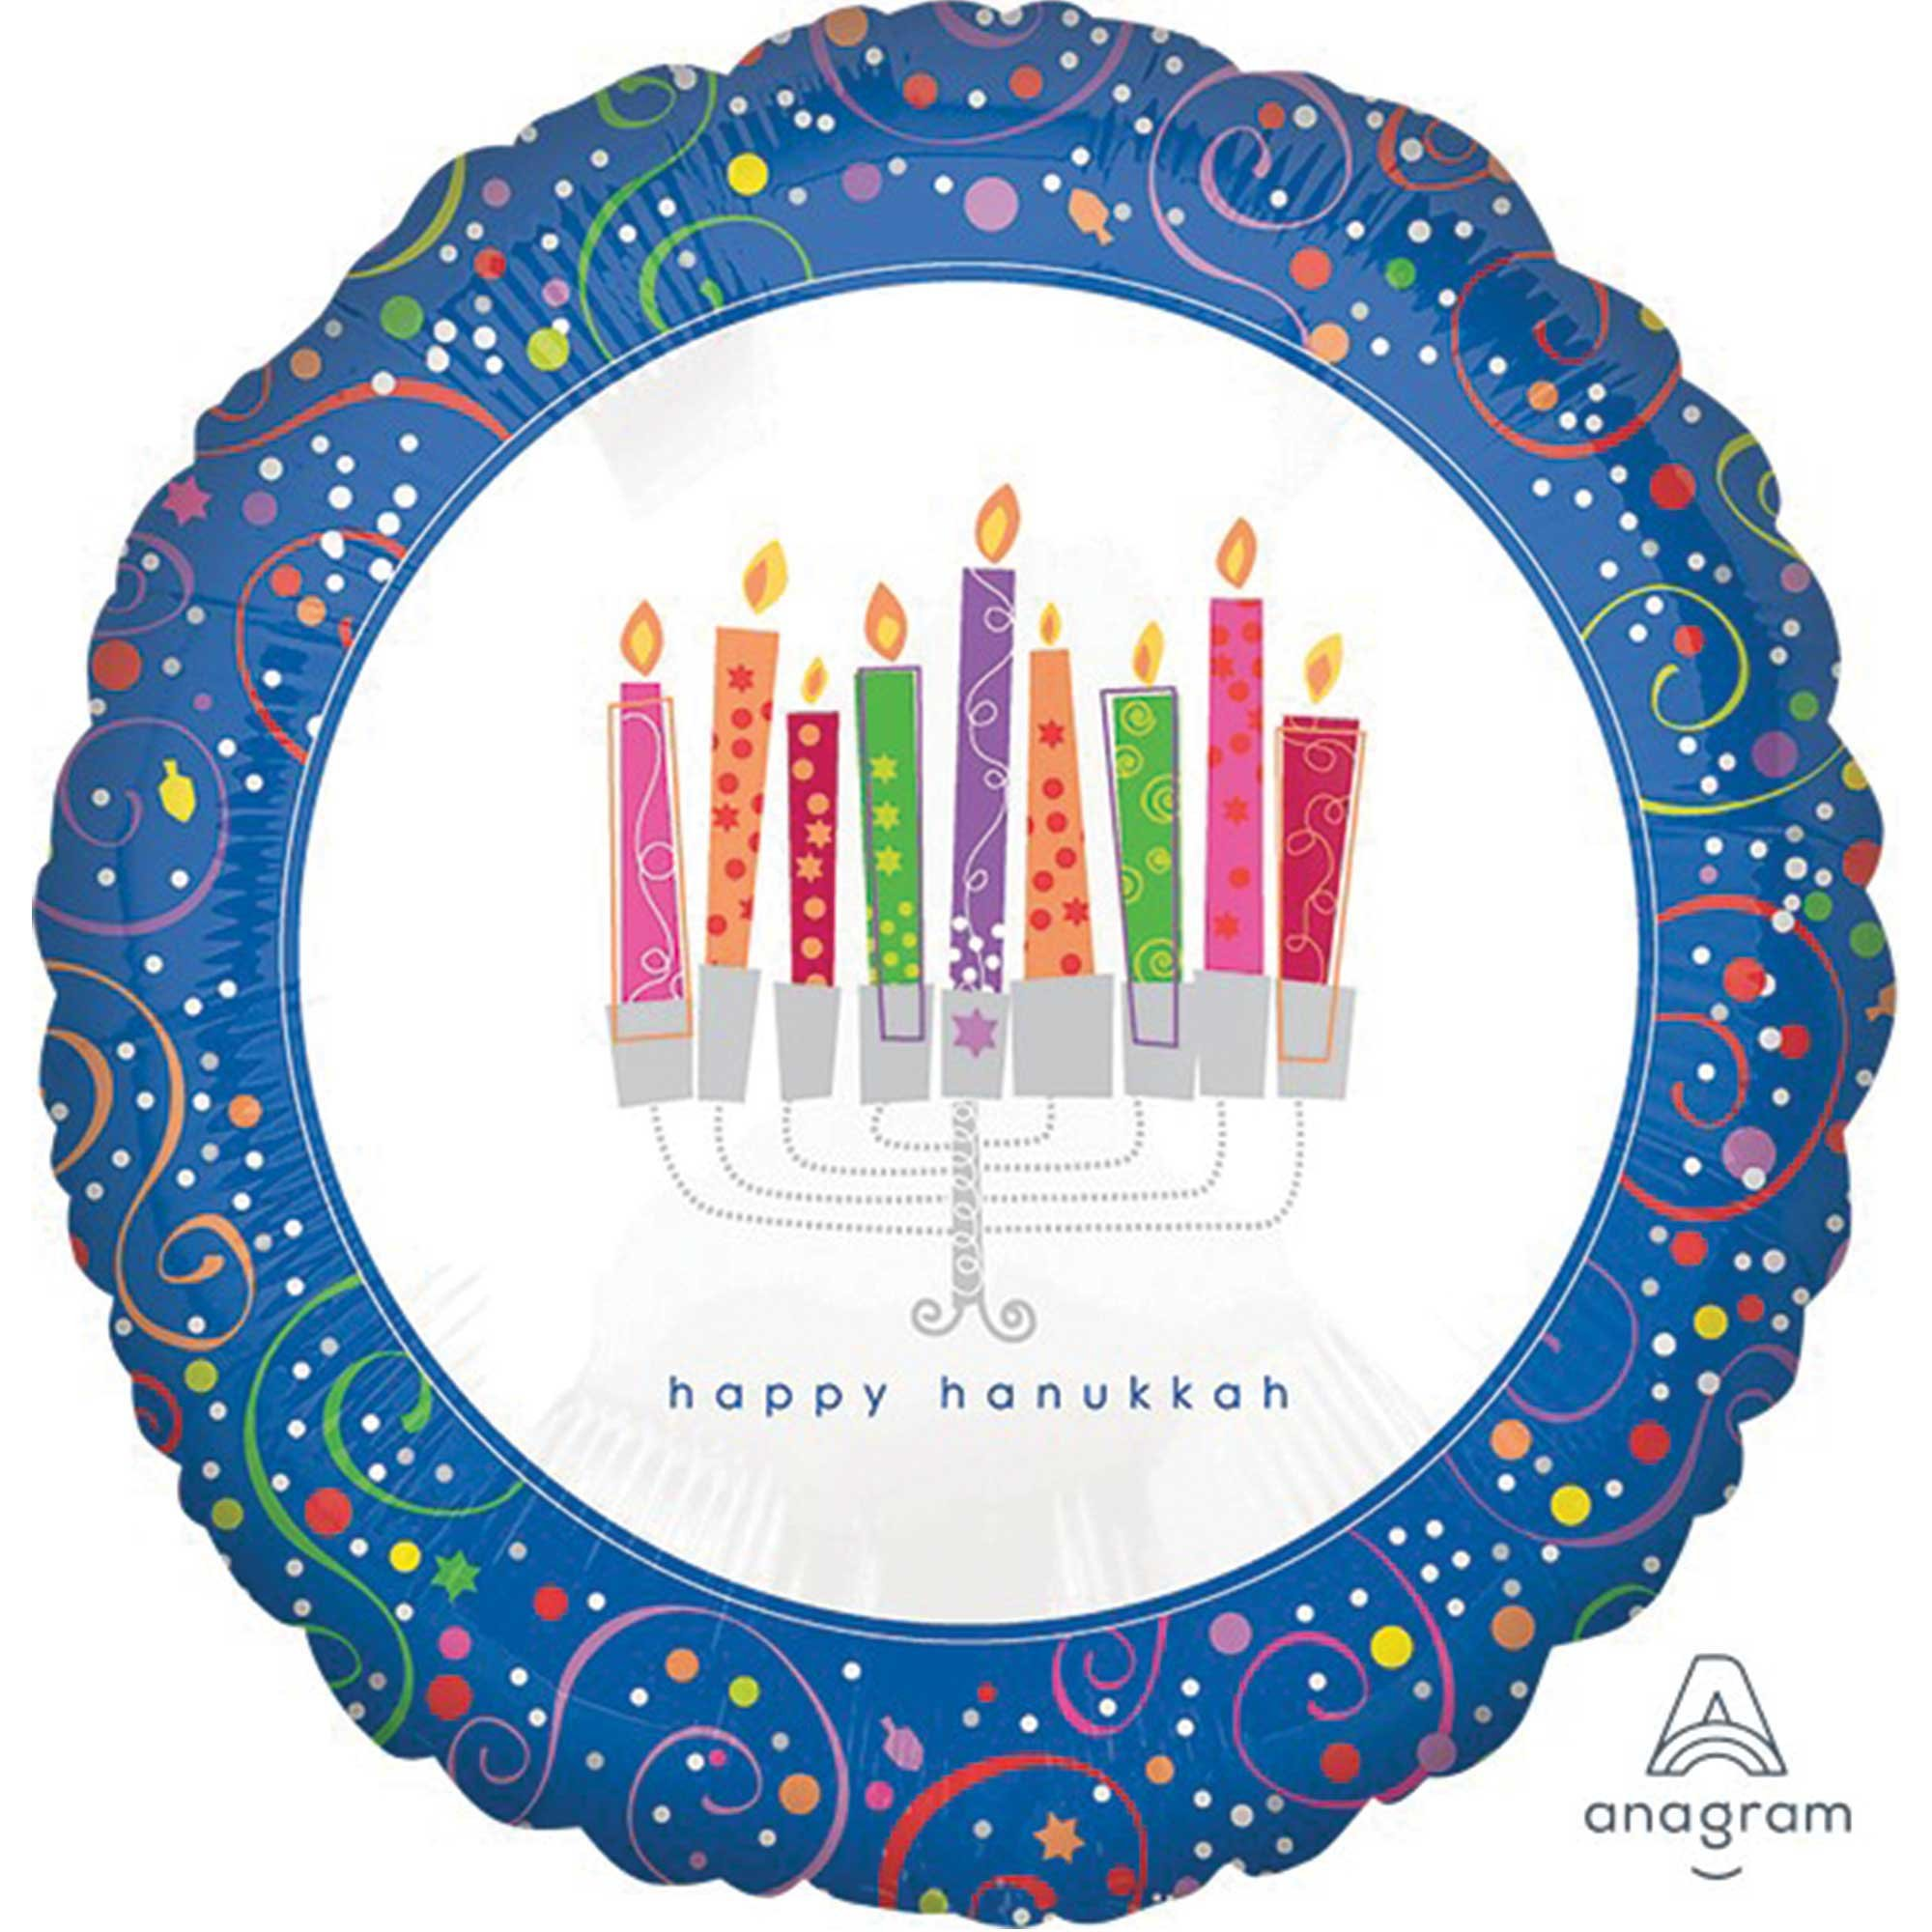 45cm Standard XL Playful Menorah Happy Hanukkah S40